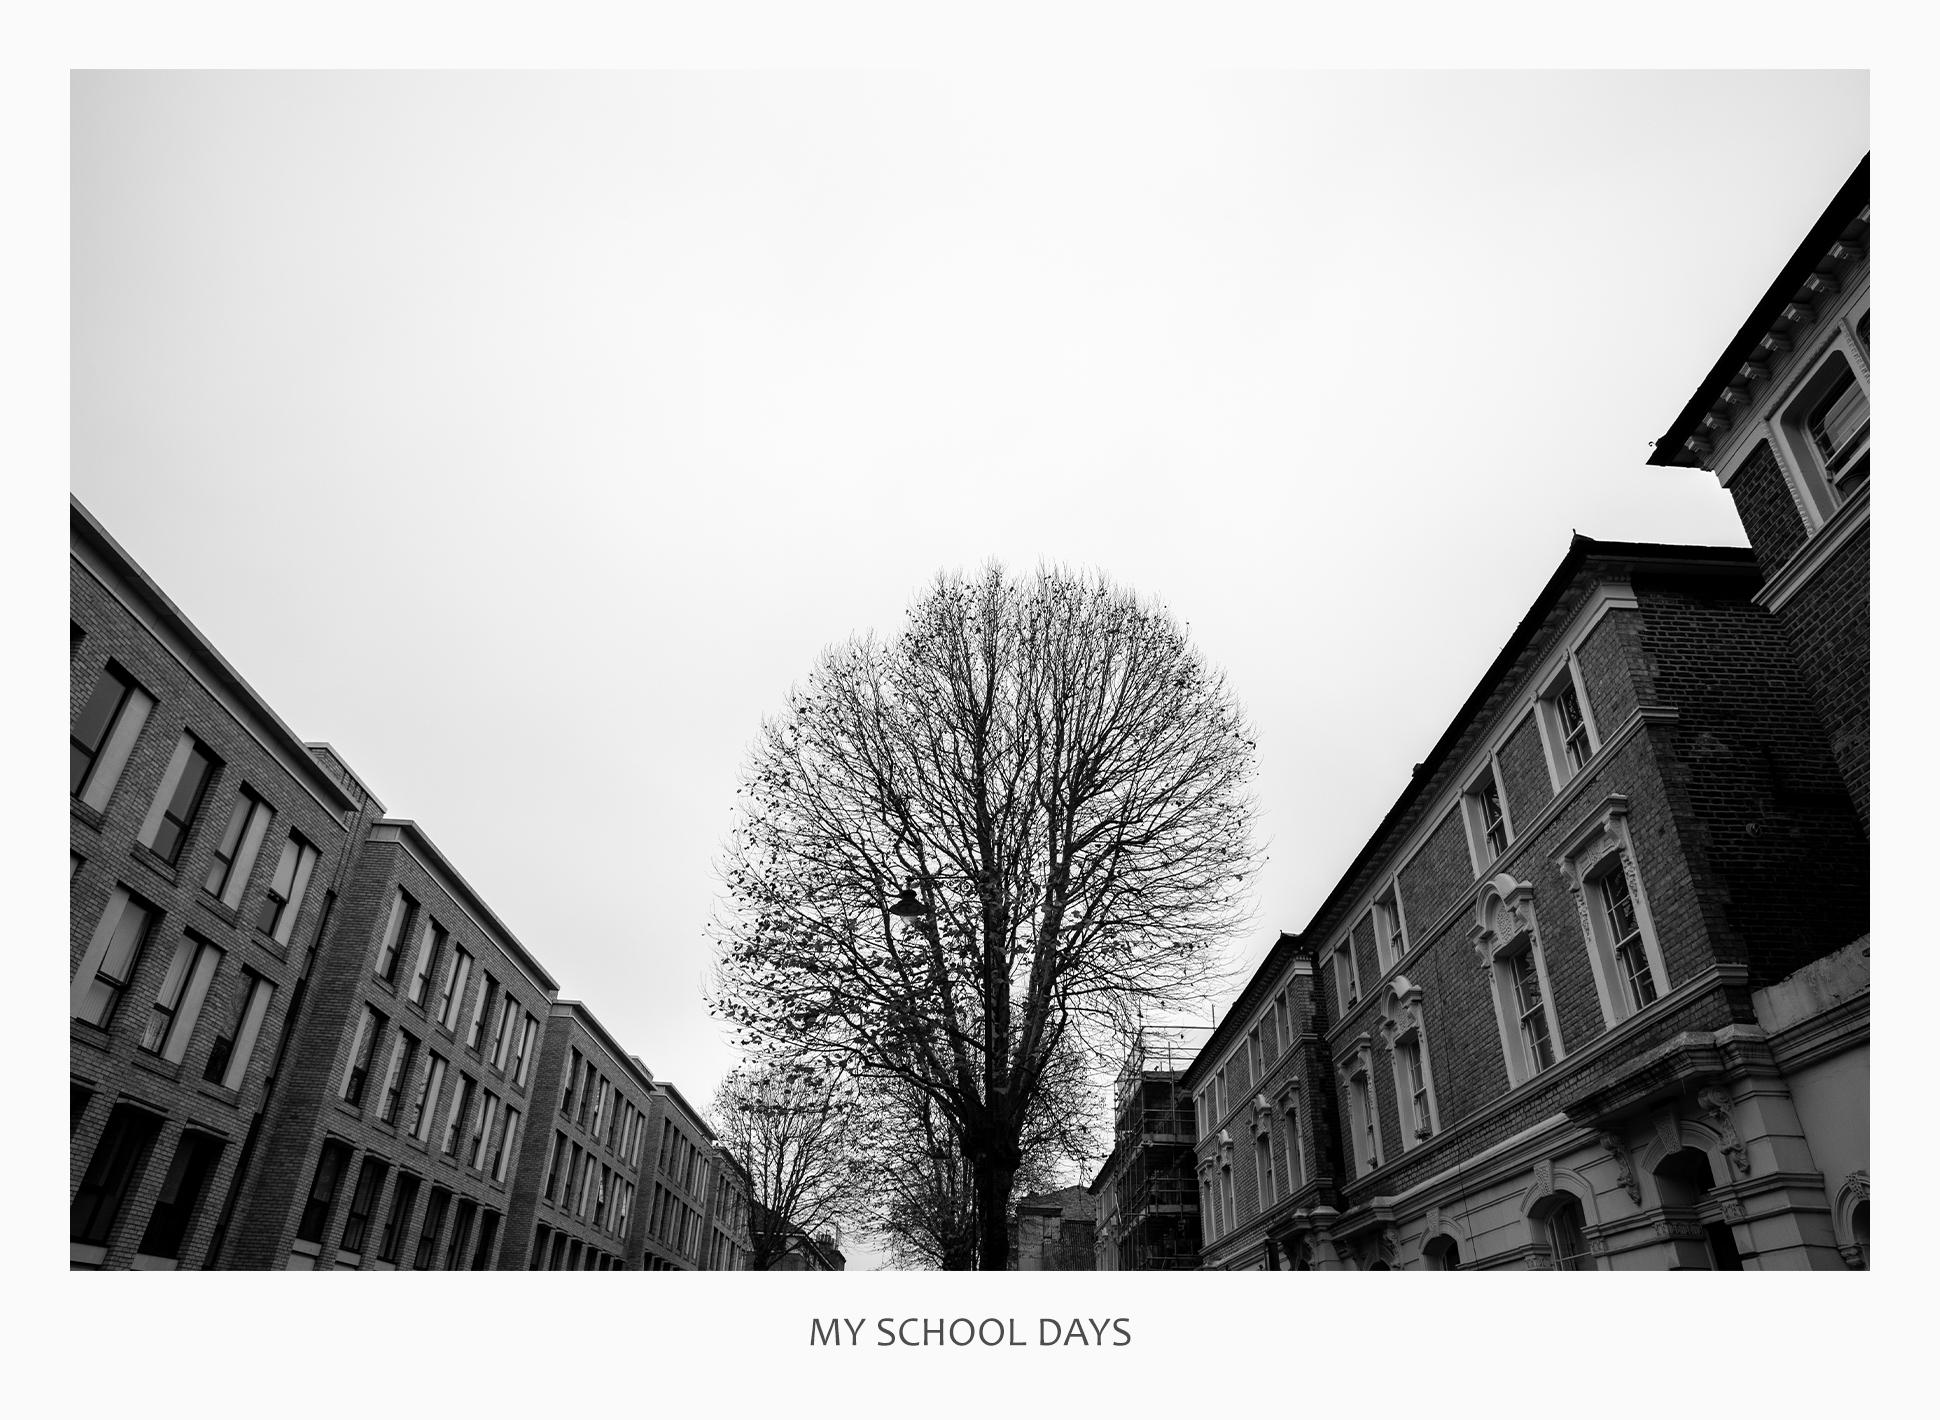 05 43681 - My School Days